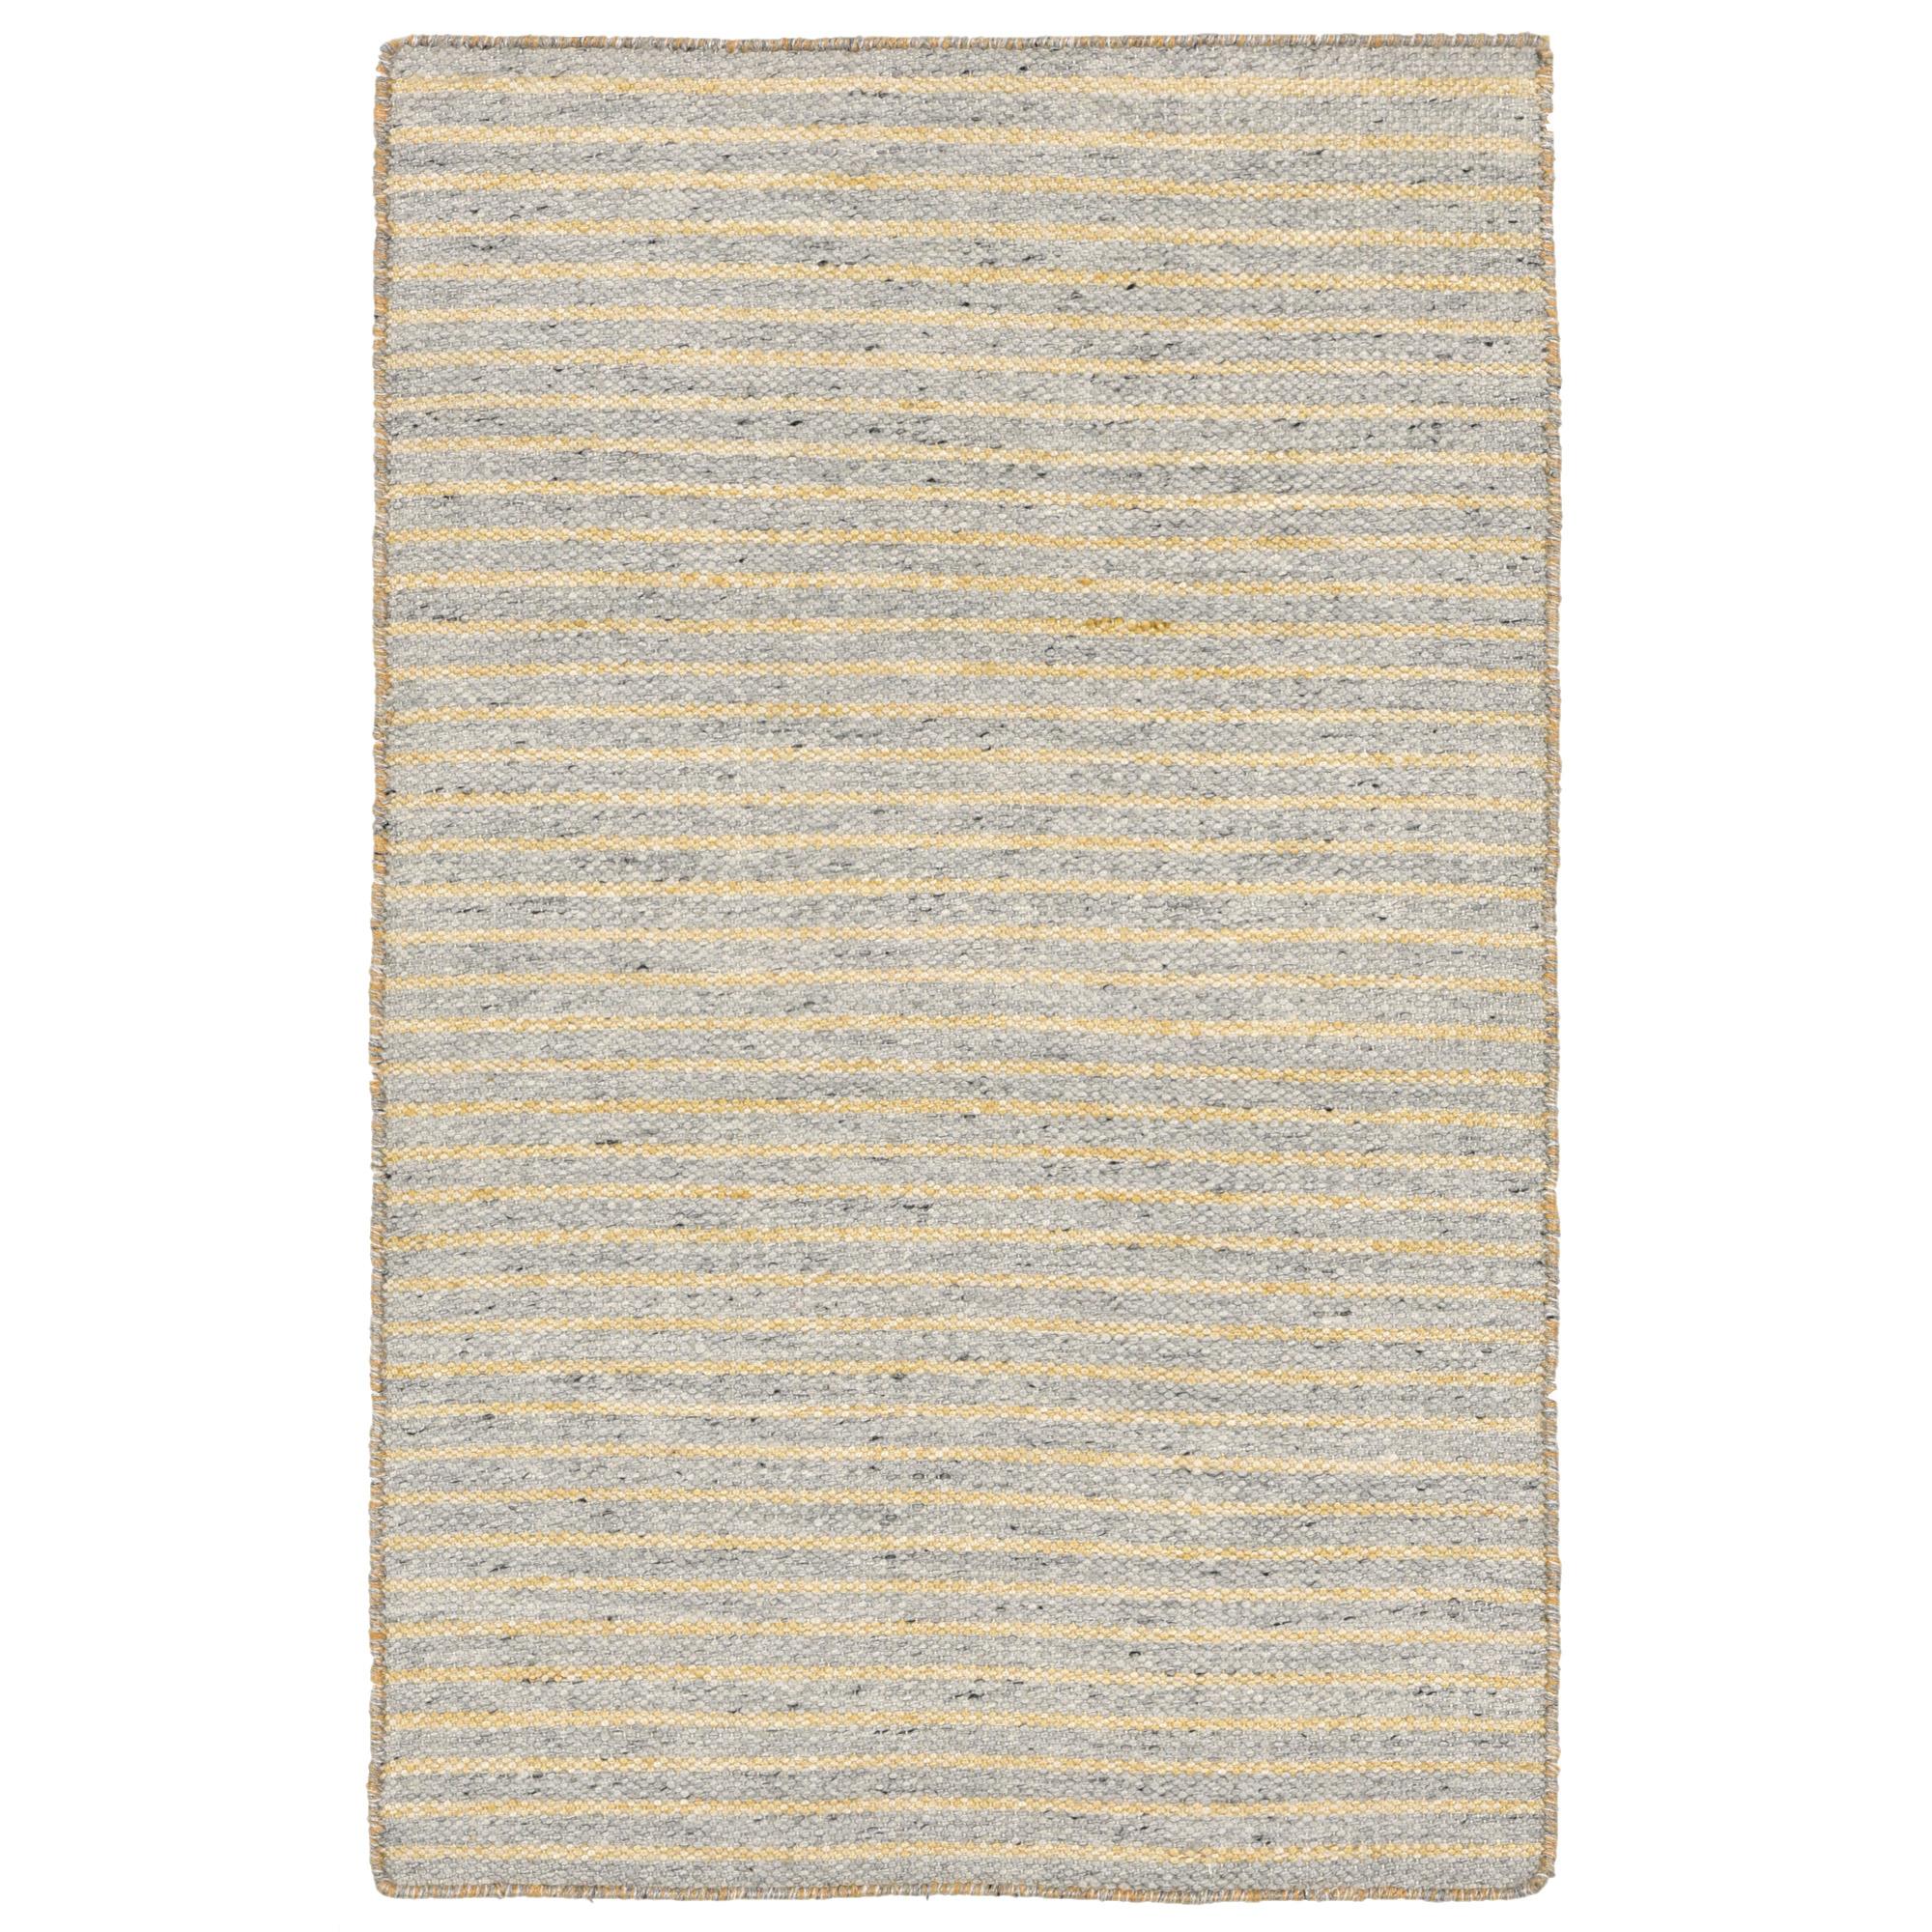 Liora Manne Mojave 6203/47 Pencil Stripe Grey Area Rug